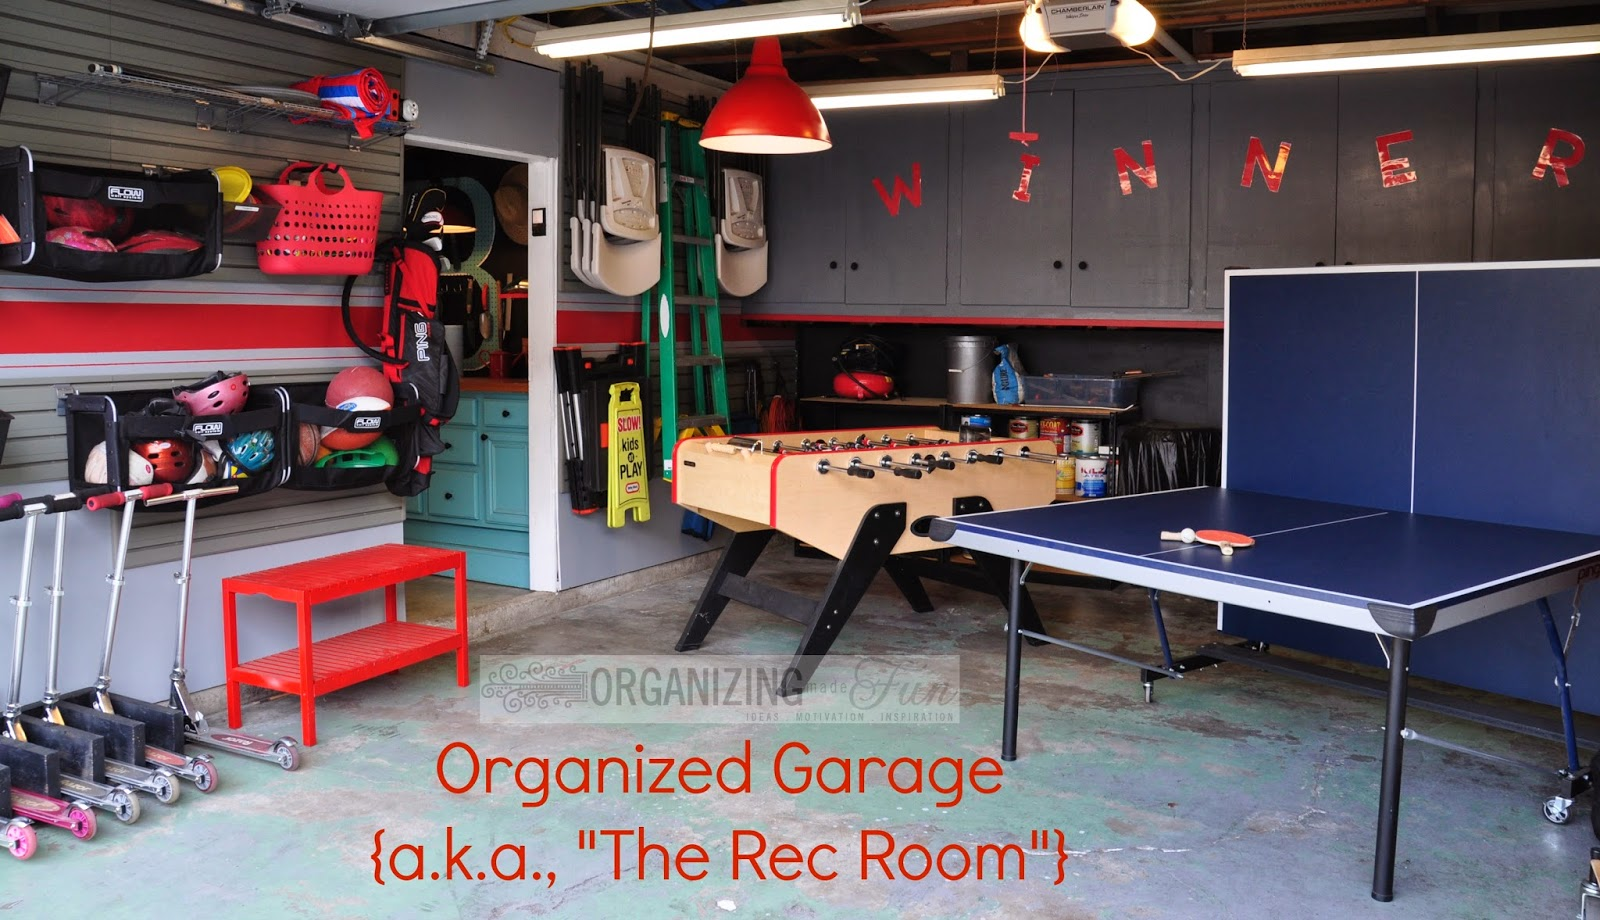 My Garage Is More Organized Organizing Made Fun My